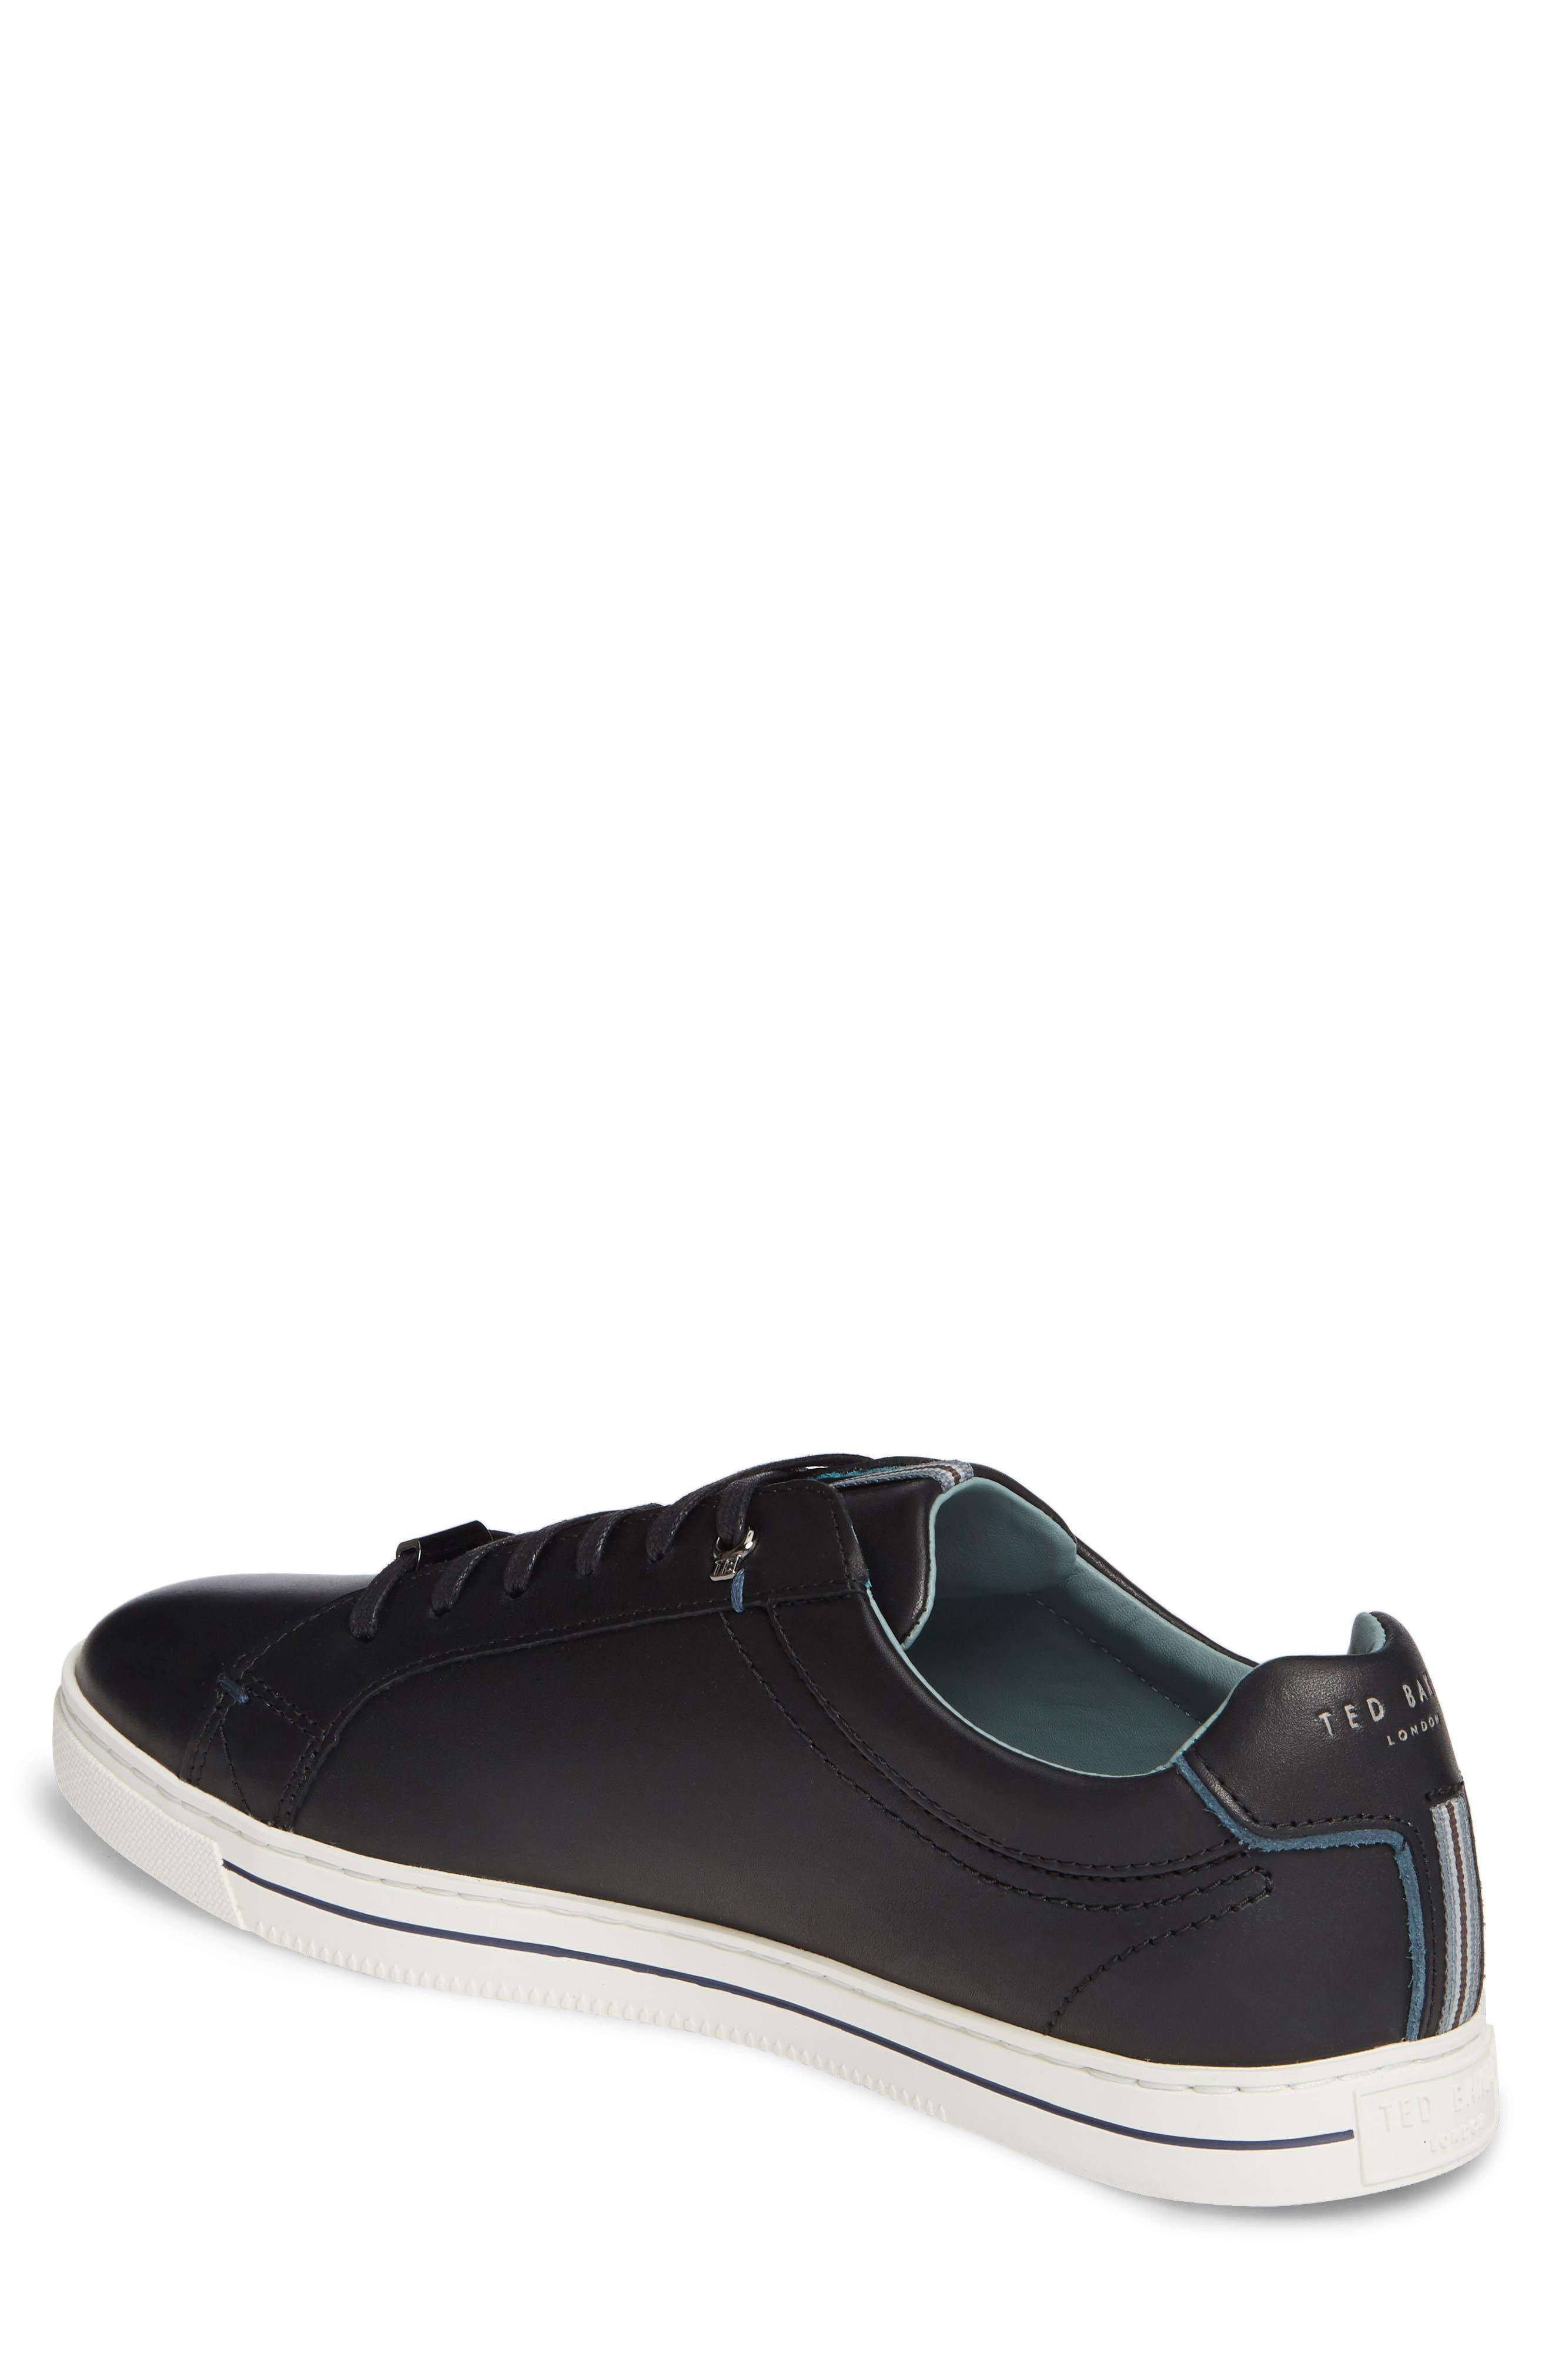 TED BAKER LONDON,                             Thawne Sneaker,                             Alternate thumbnail 2, color,                             BLACK LEATHER